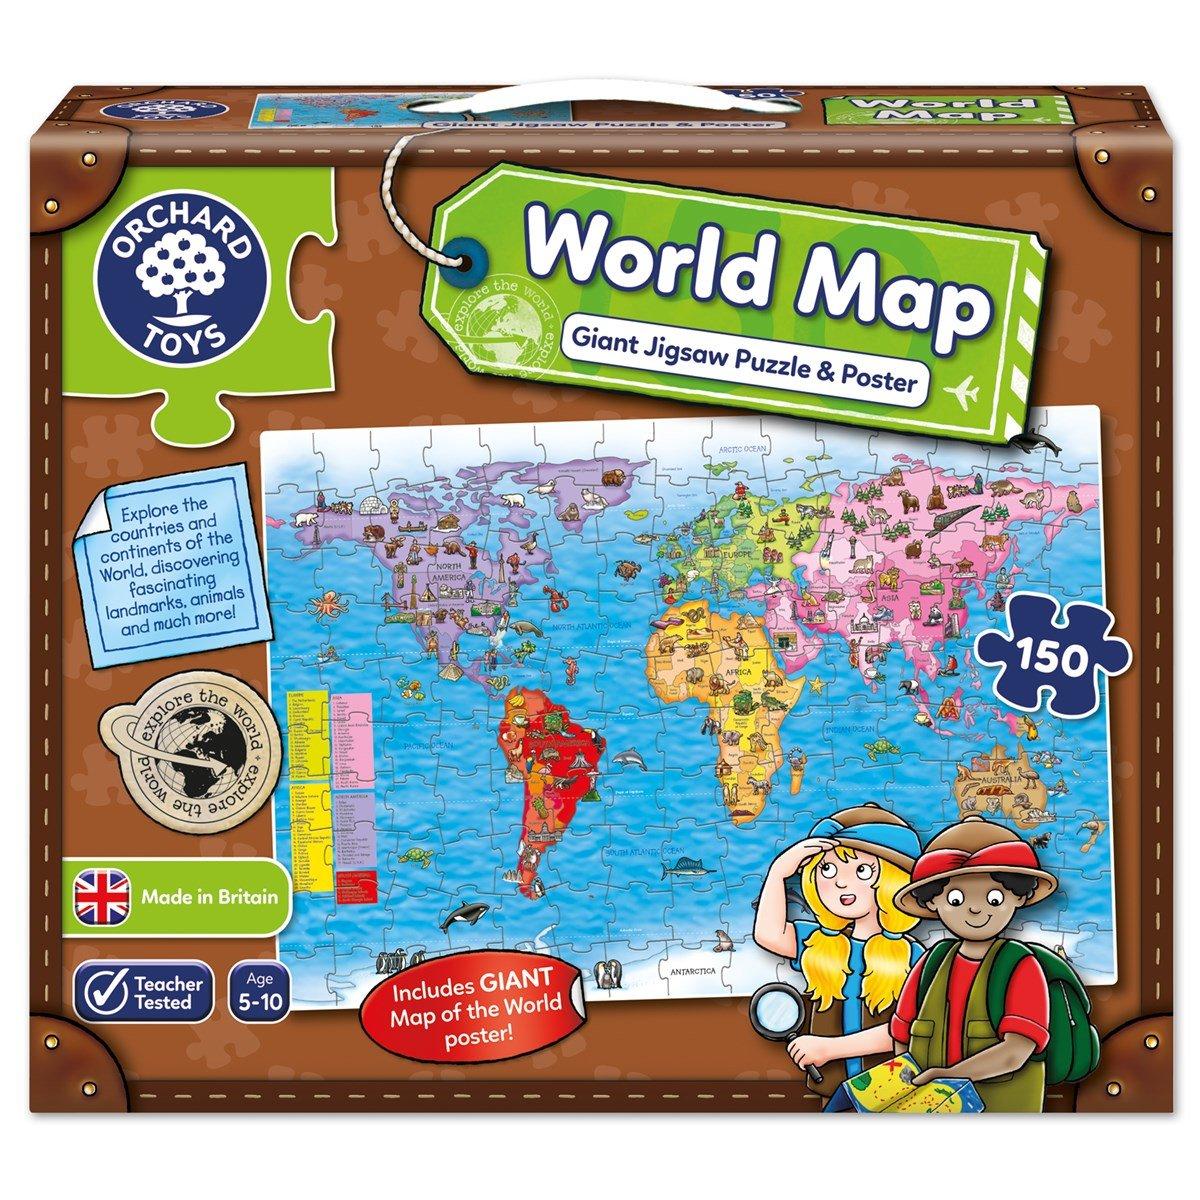 World map poster 280 gotilandia world map poster 280 gumiabroncs Images